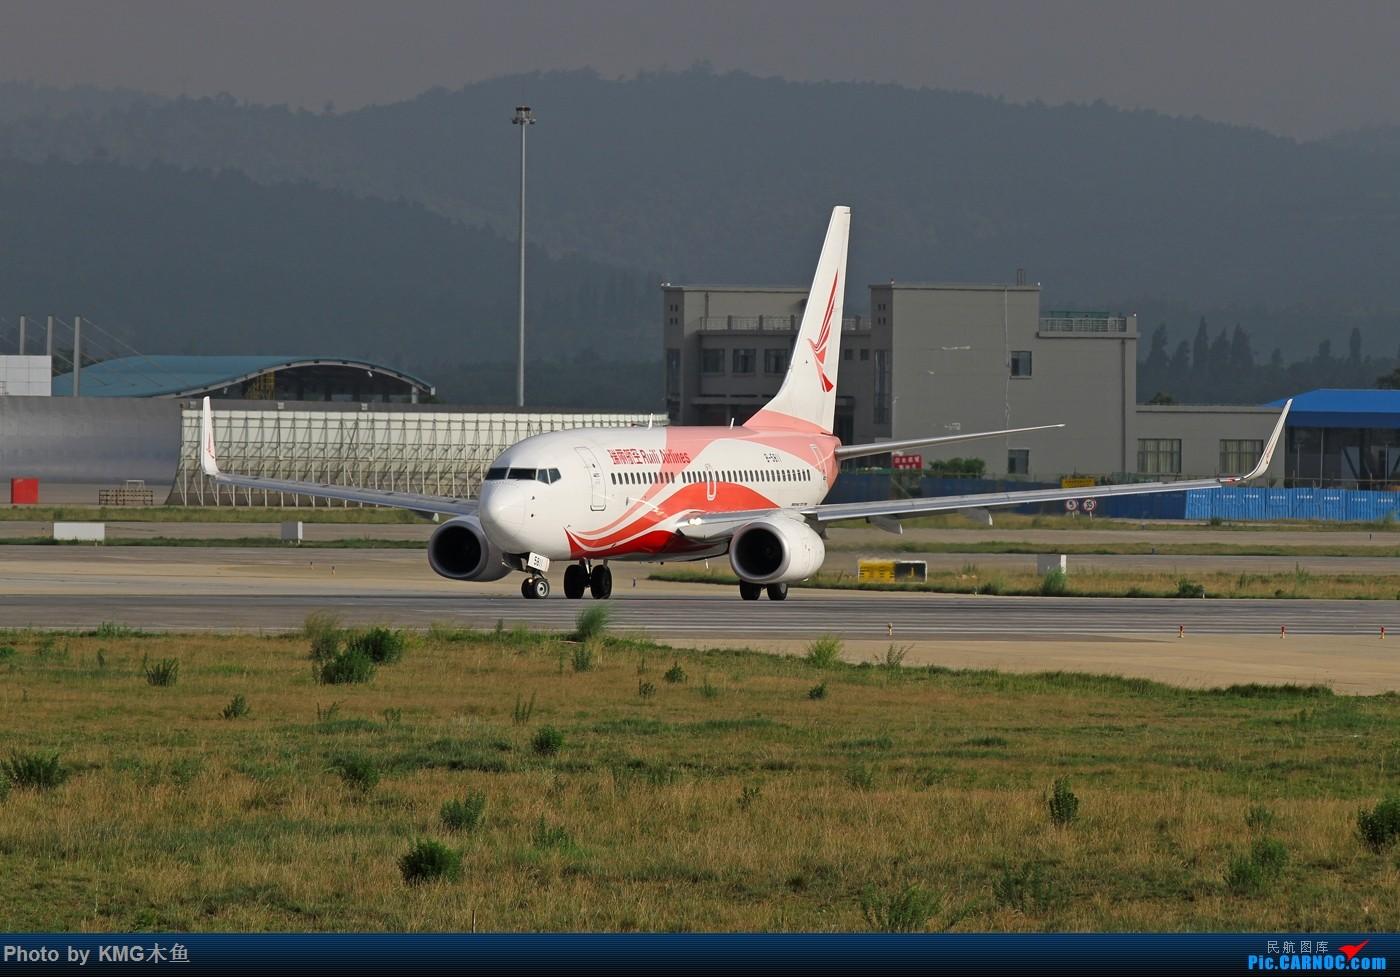 Re:[原创]【KMG】【端午节上午昆明长水国际机场拍机】拍机还能遇到玩拉力车的人,真心高手呀! BOEING 737-700 B-5811 中国昆明长水国际机场